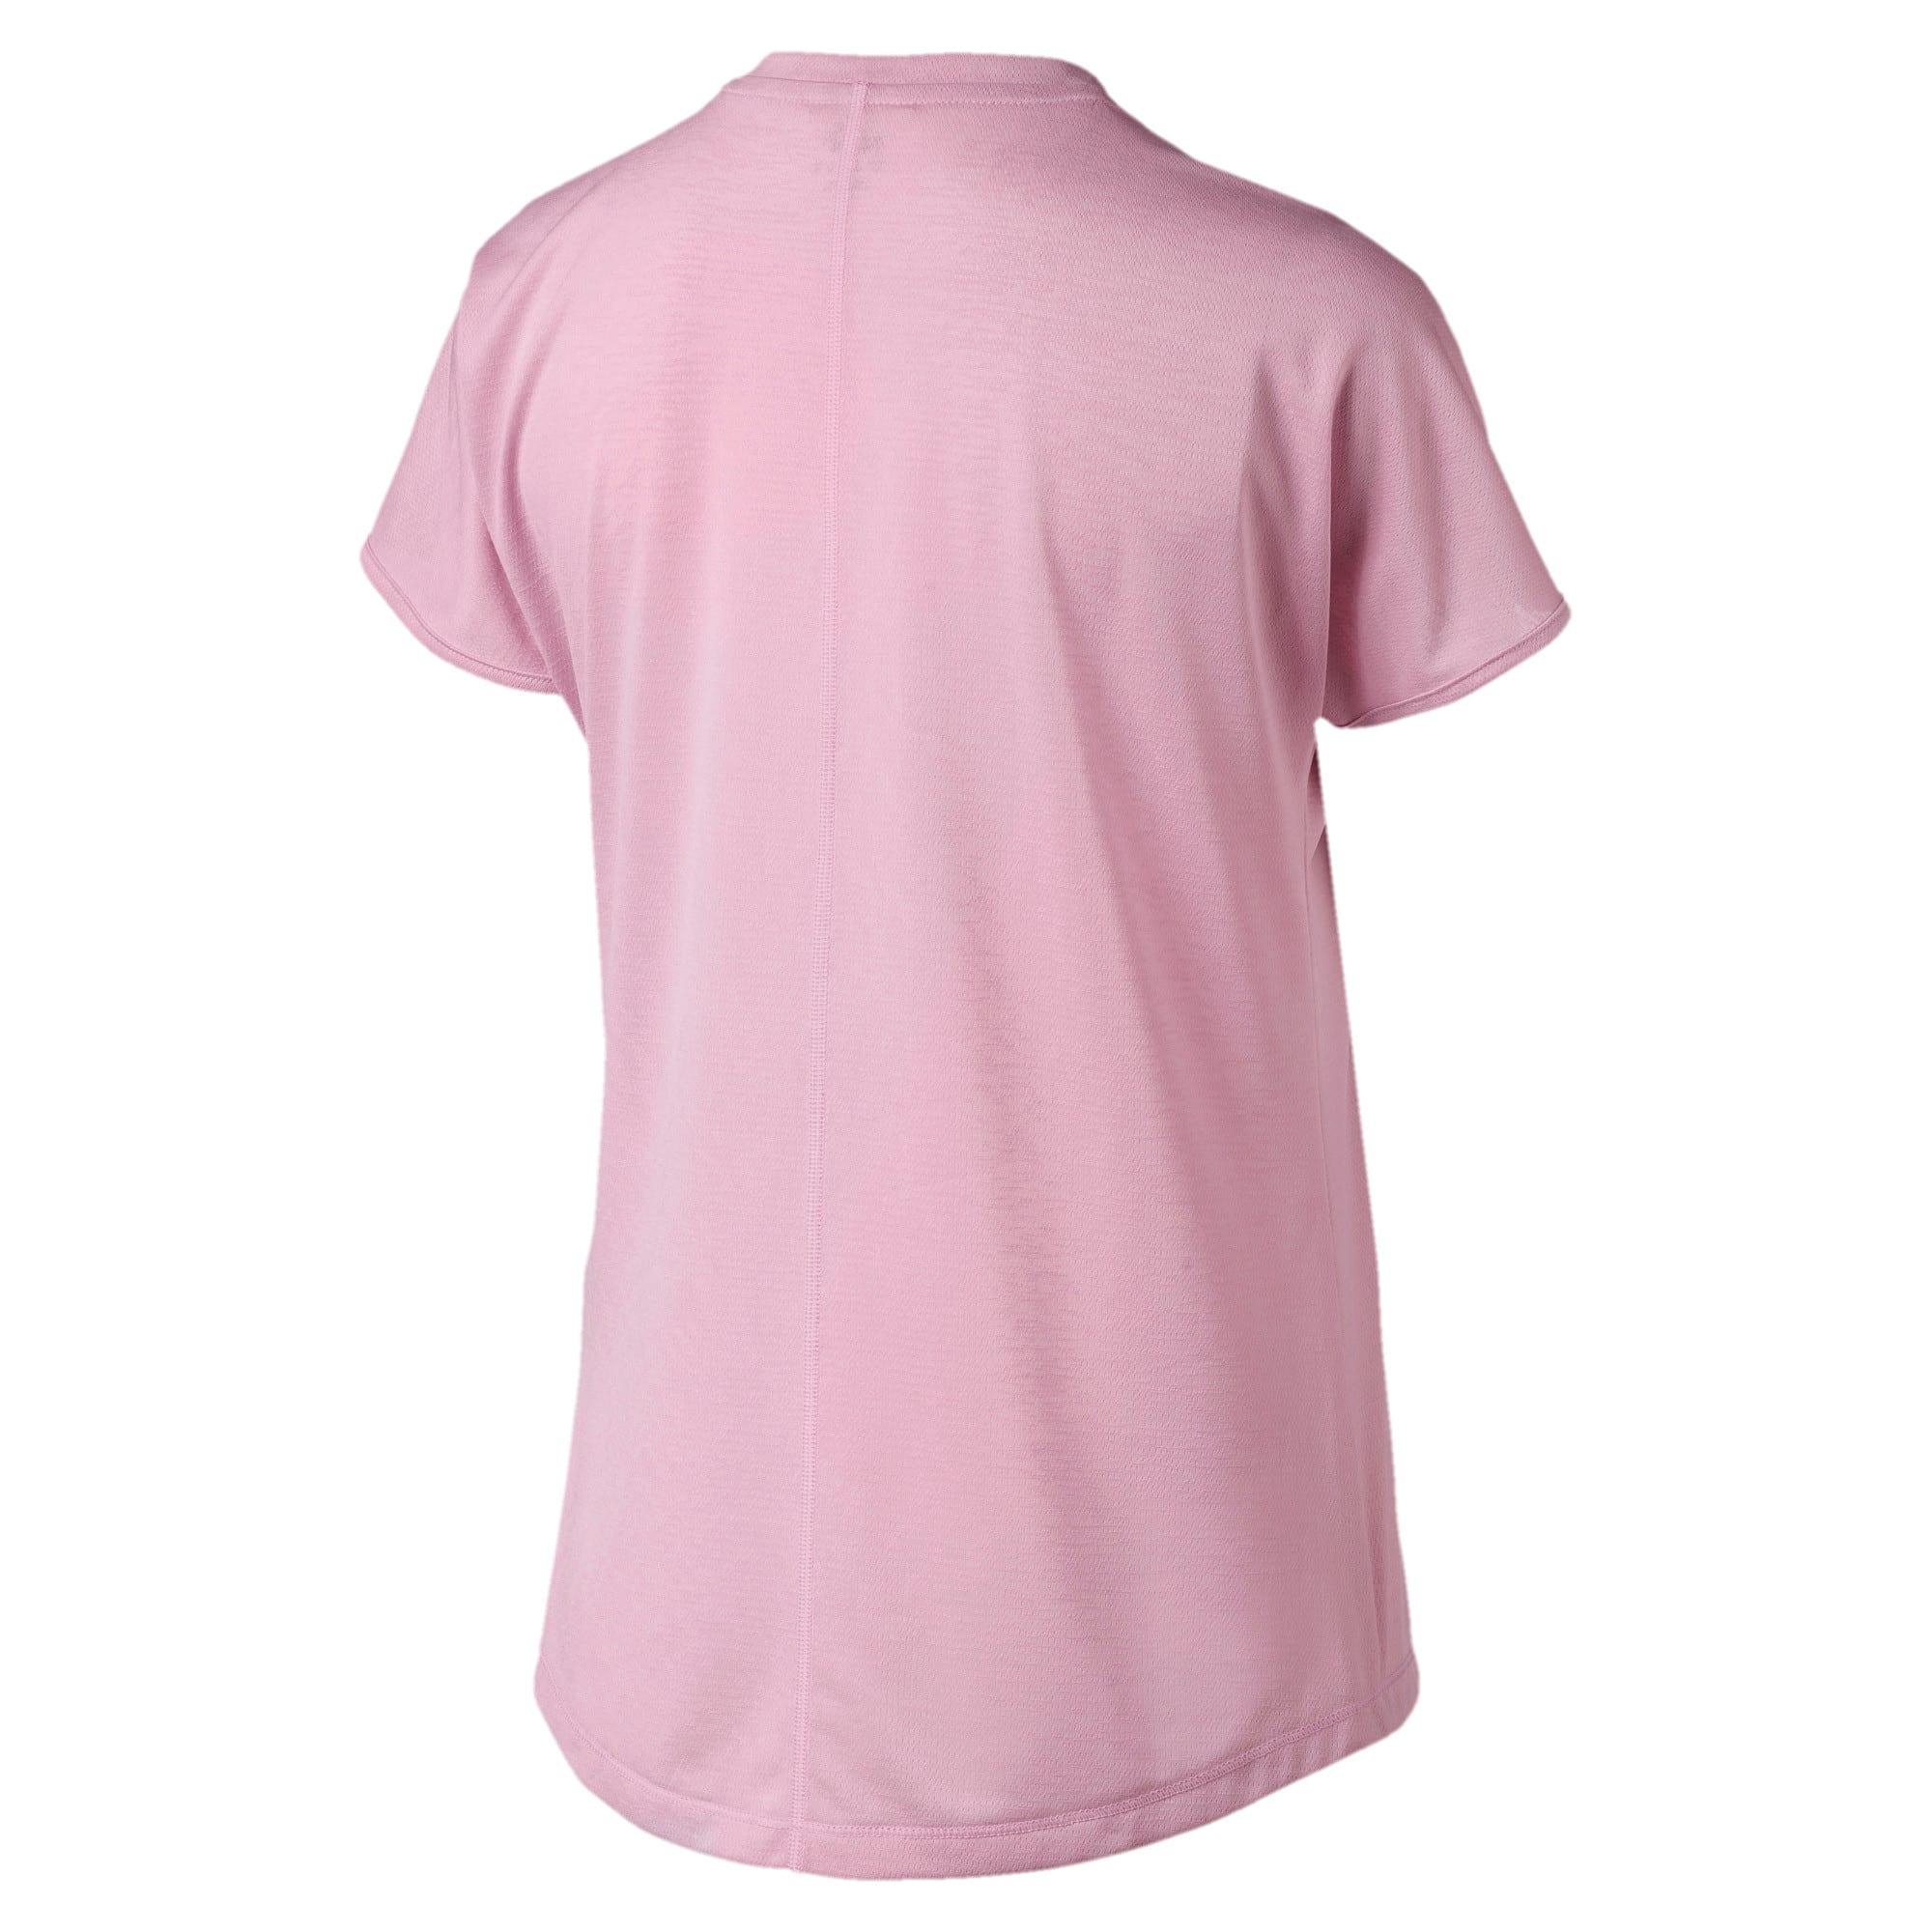 Thumbnail 4 of Explosive CAT Short Sleeve Women's Training Tee, Pale Pink, medium-IND